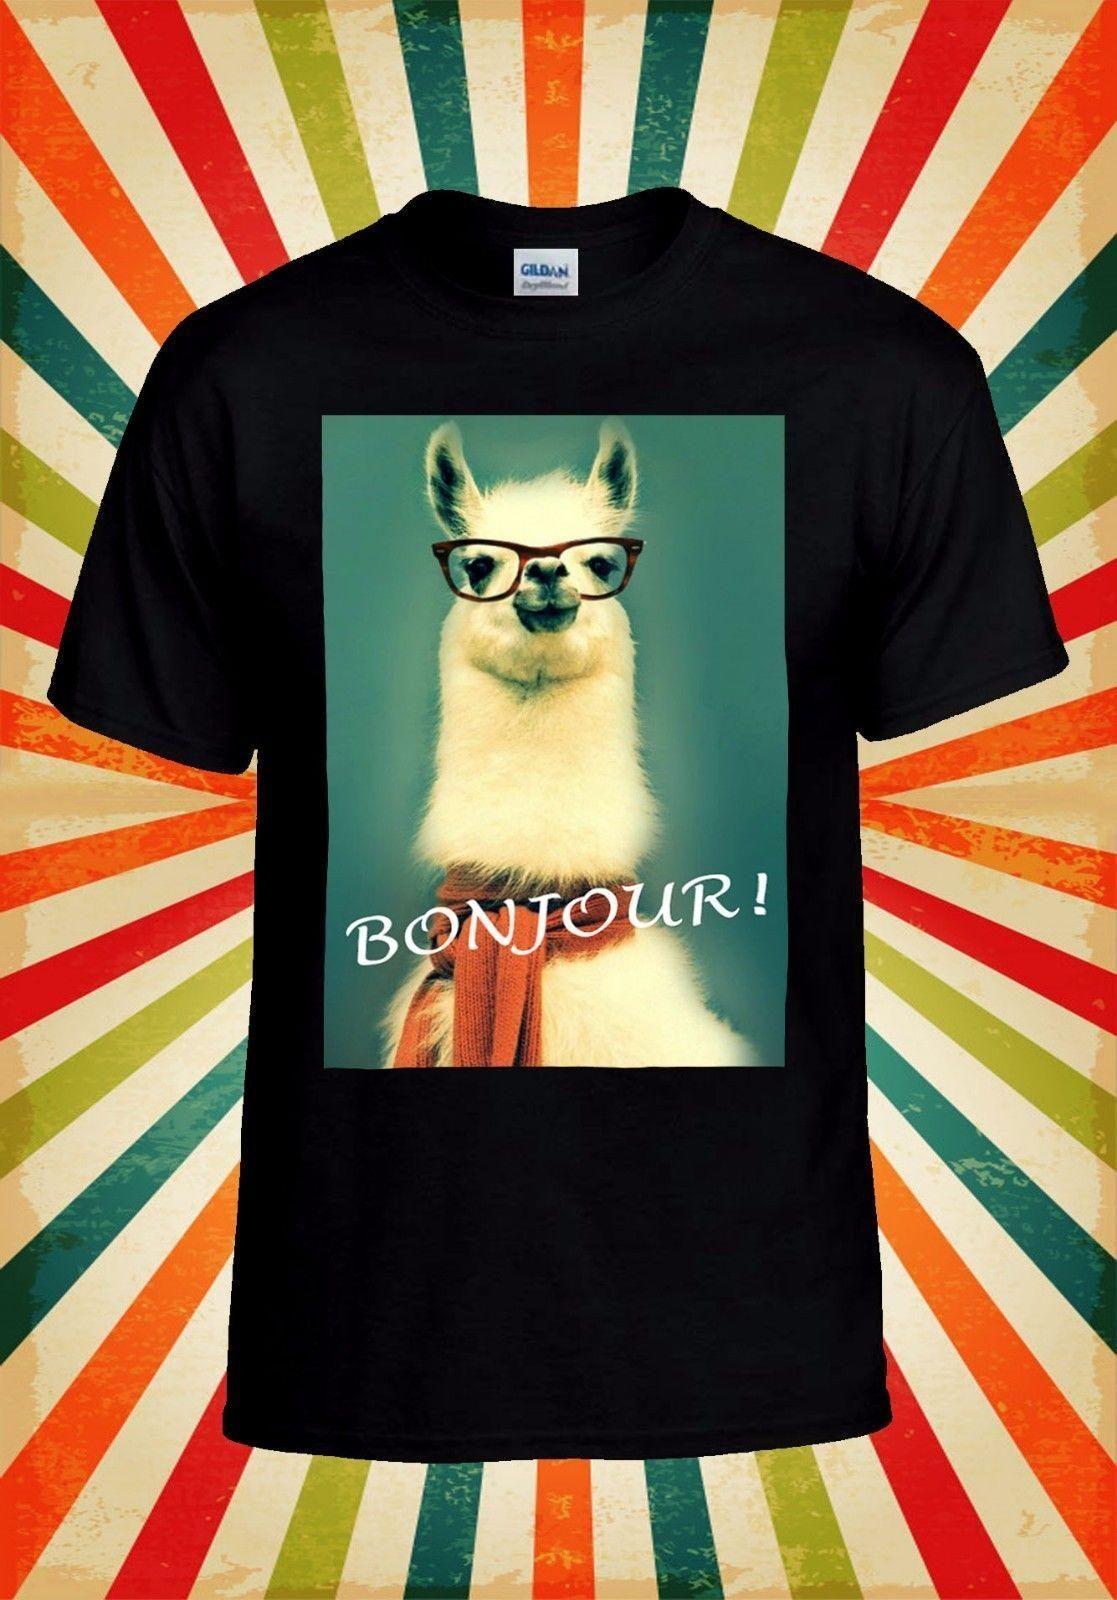 FASHION Tops T-shirt Short Sleeve t-shirt Cotton Women Bonjour JUST DO IT  top